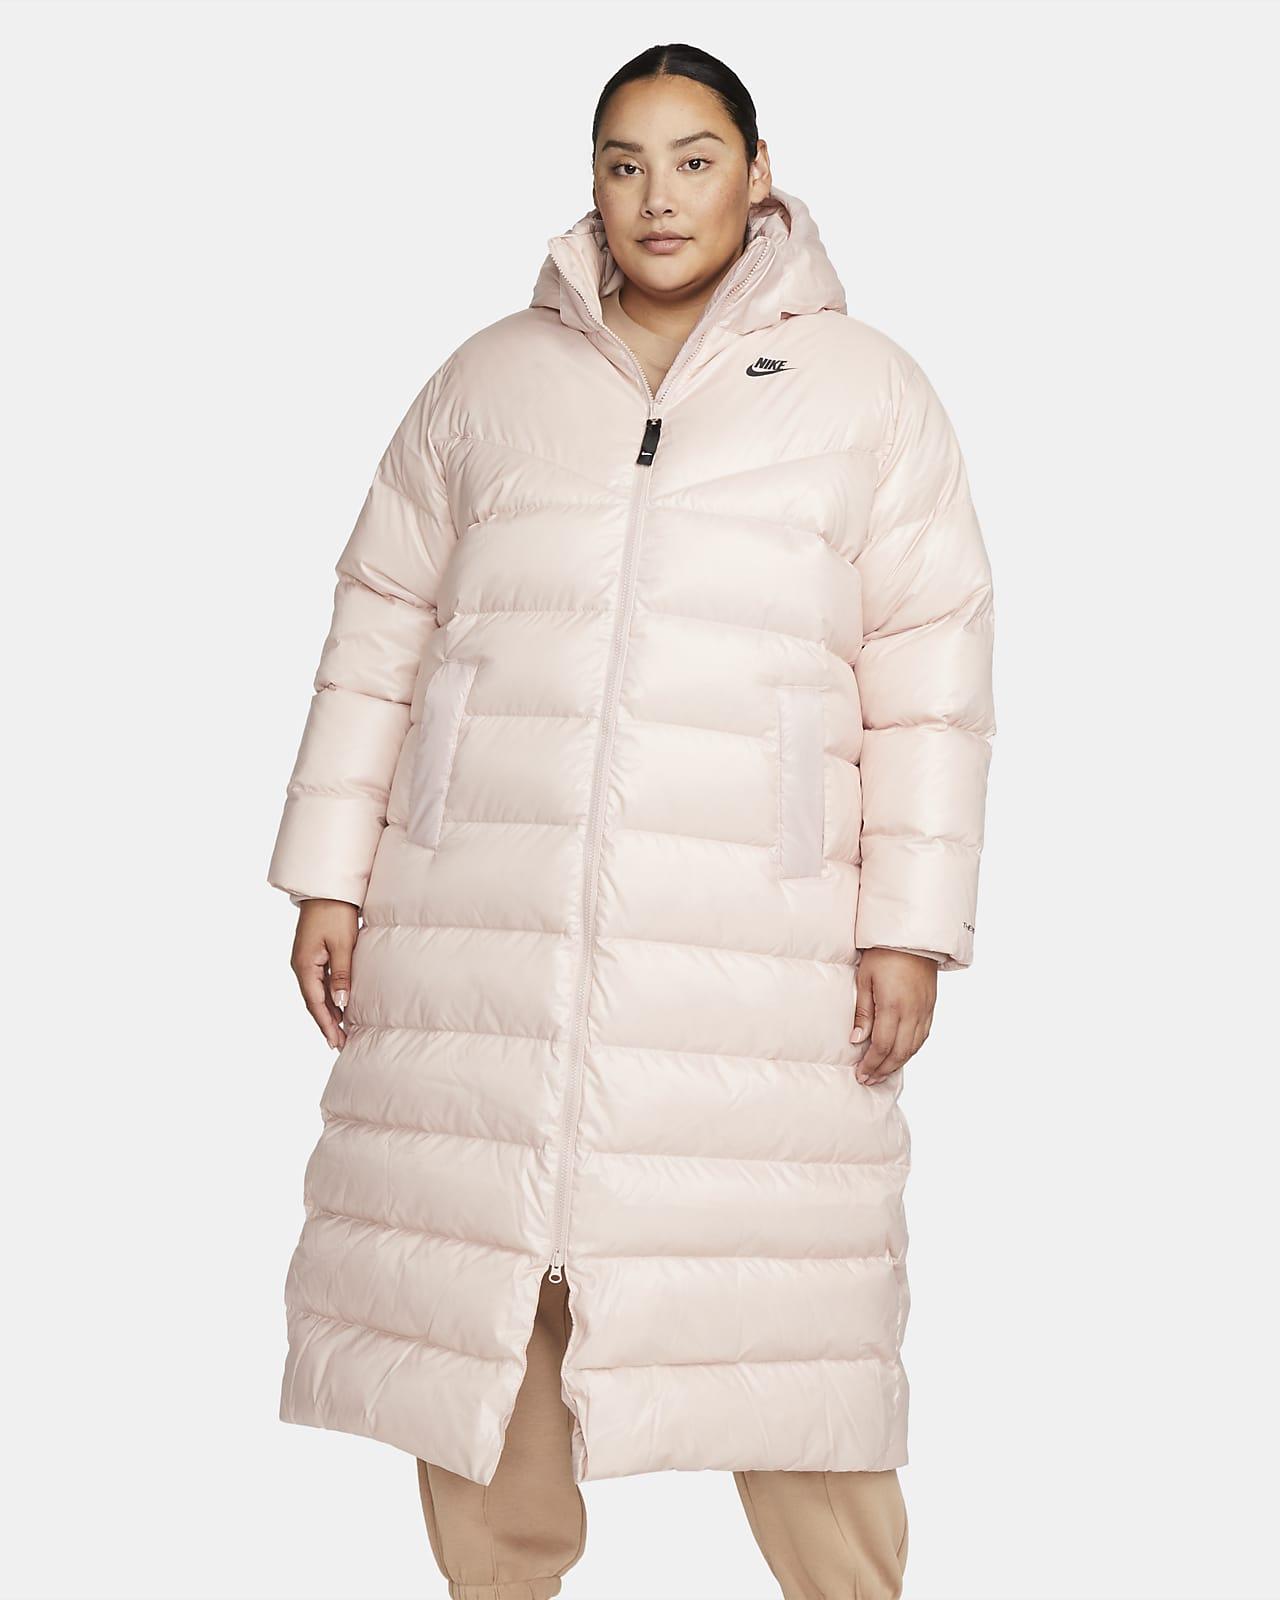 Nike Sportswear Therma-FIT City Series Women's Parka (Plus Size)